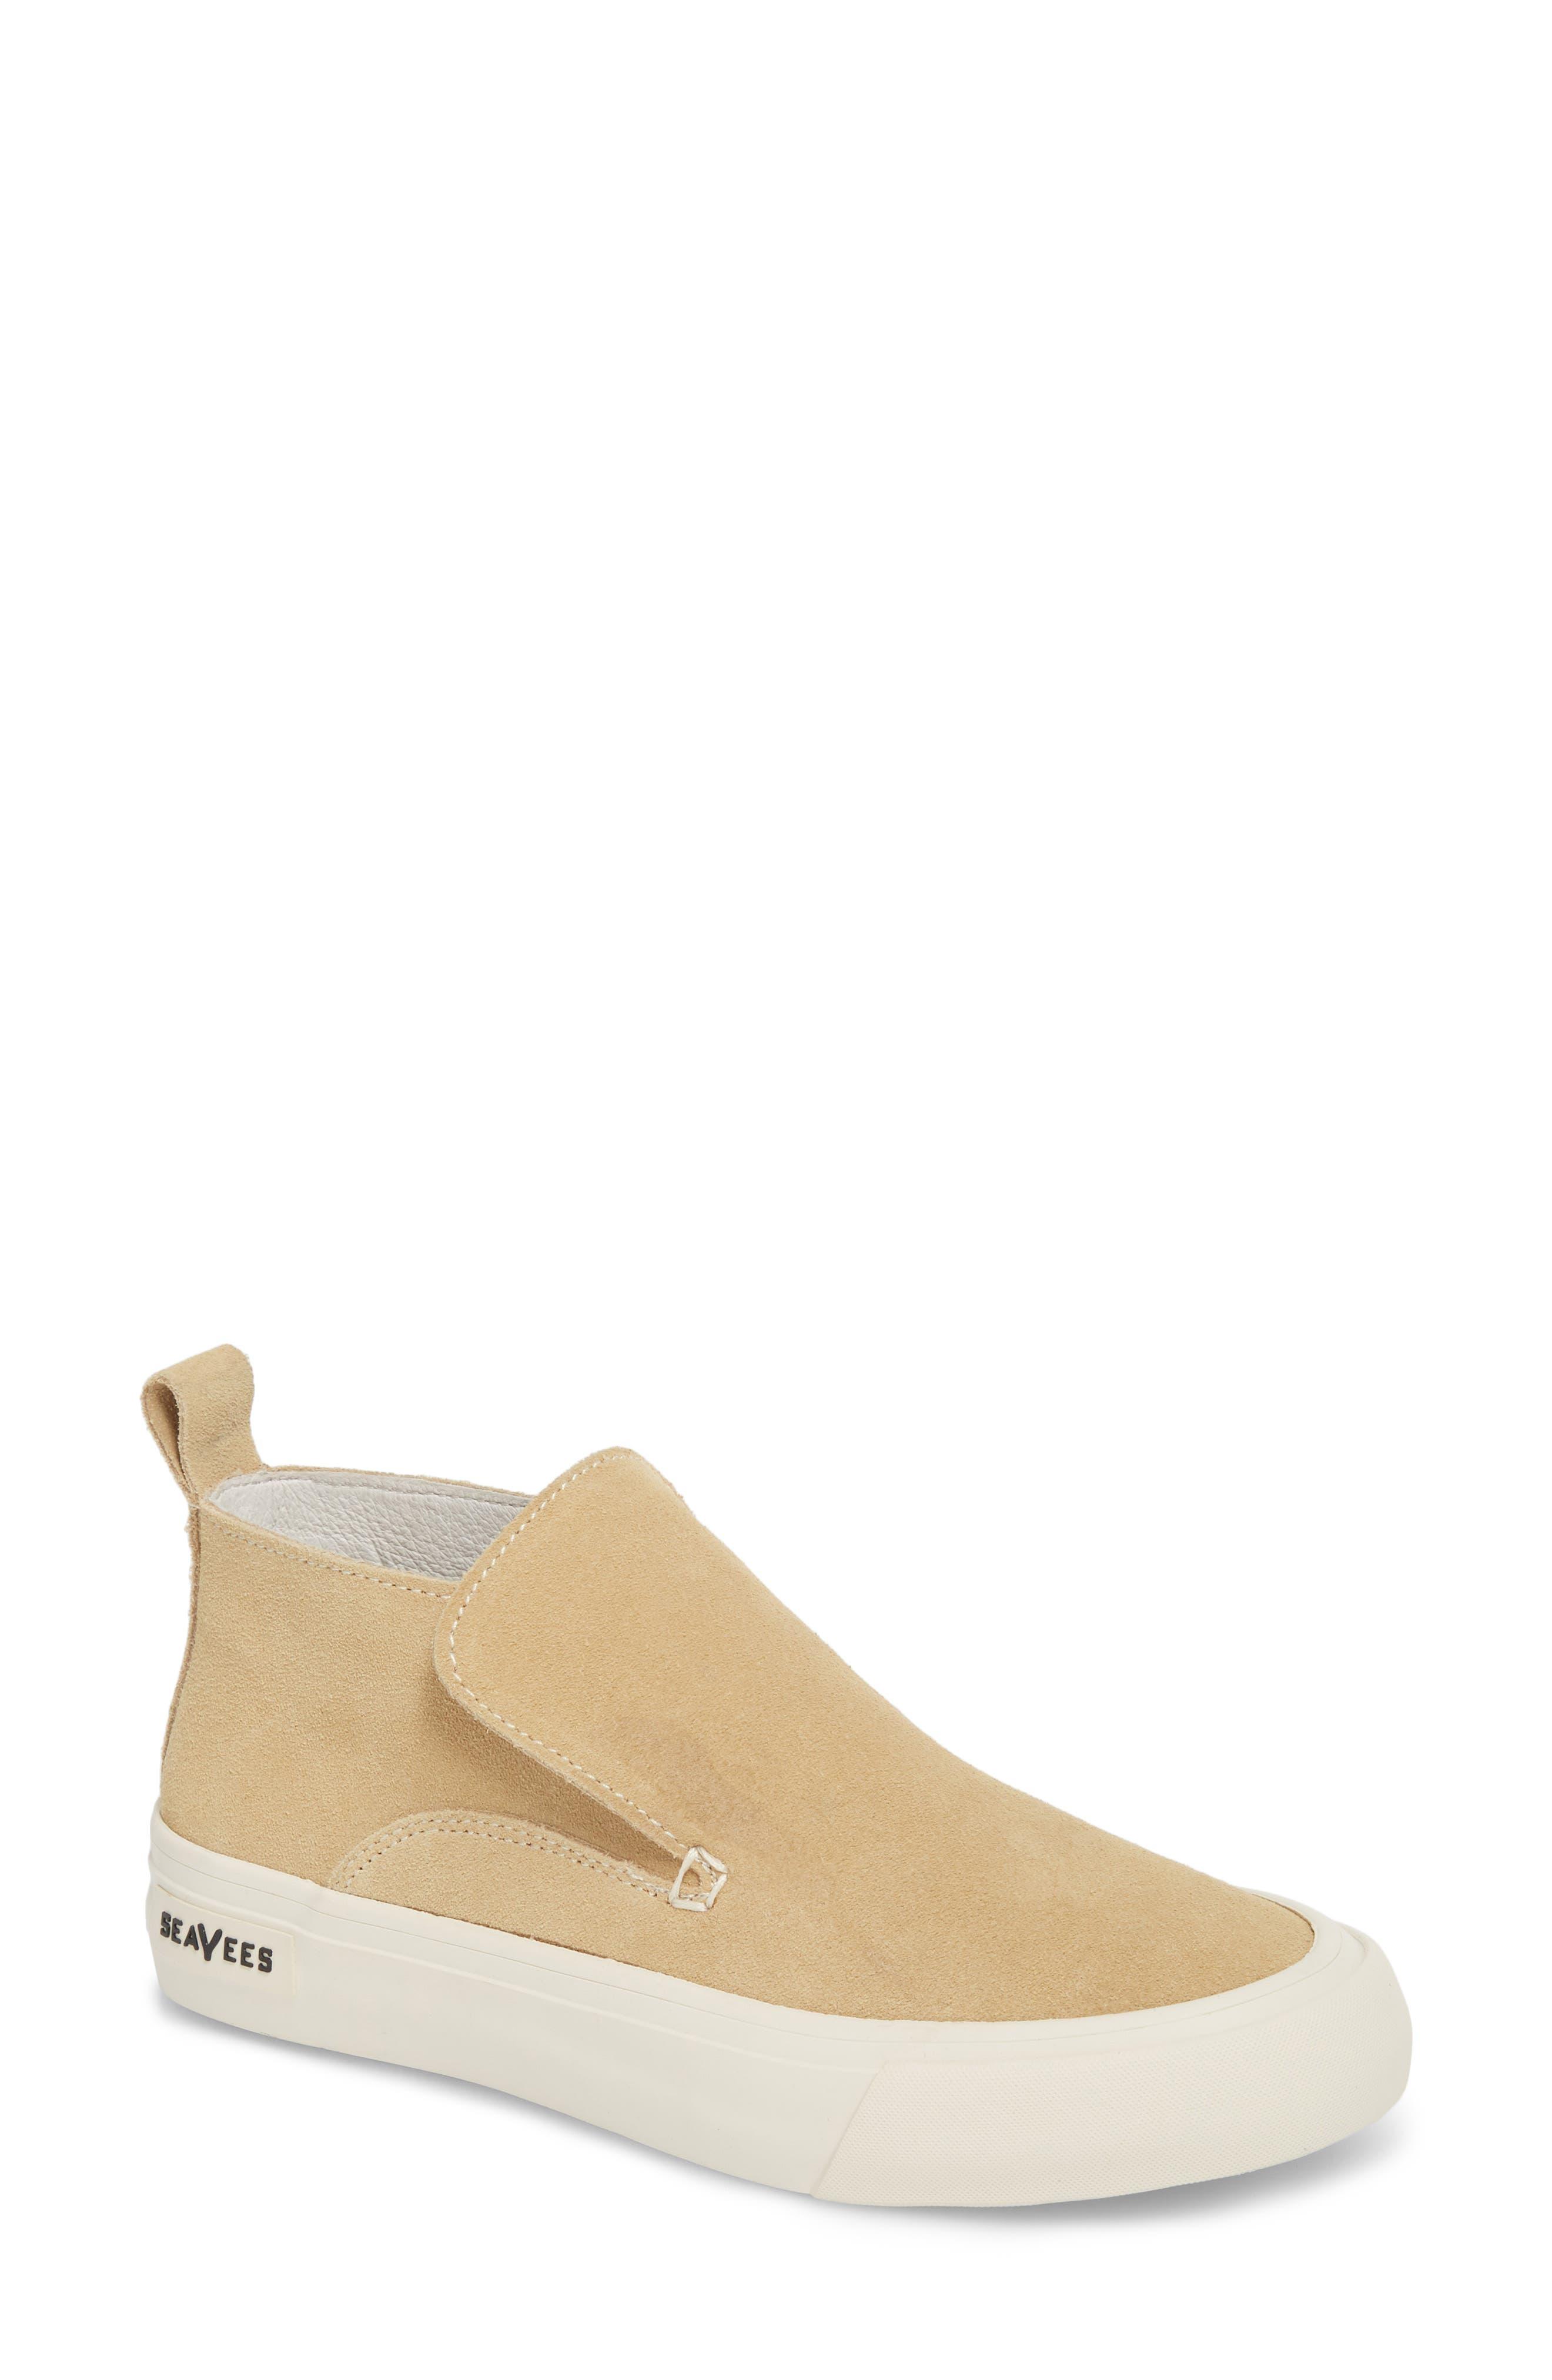 Huntington Middie Slip-On Sneaker,                         Main,                         color, Dune